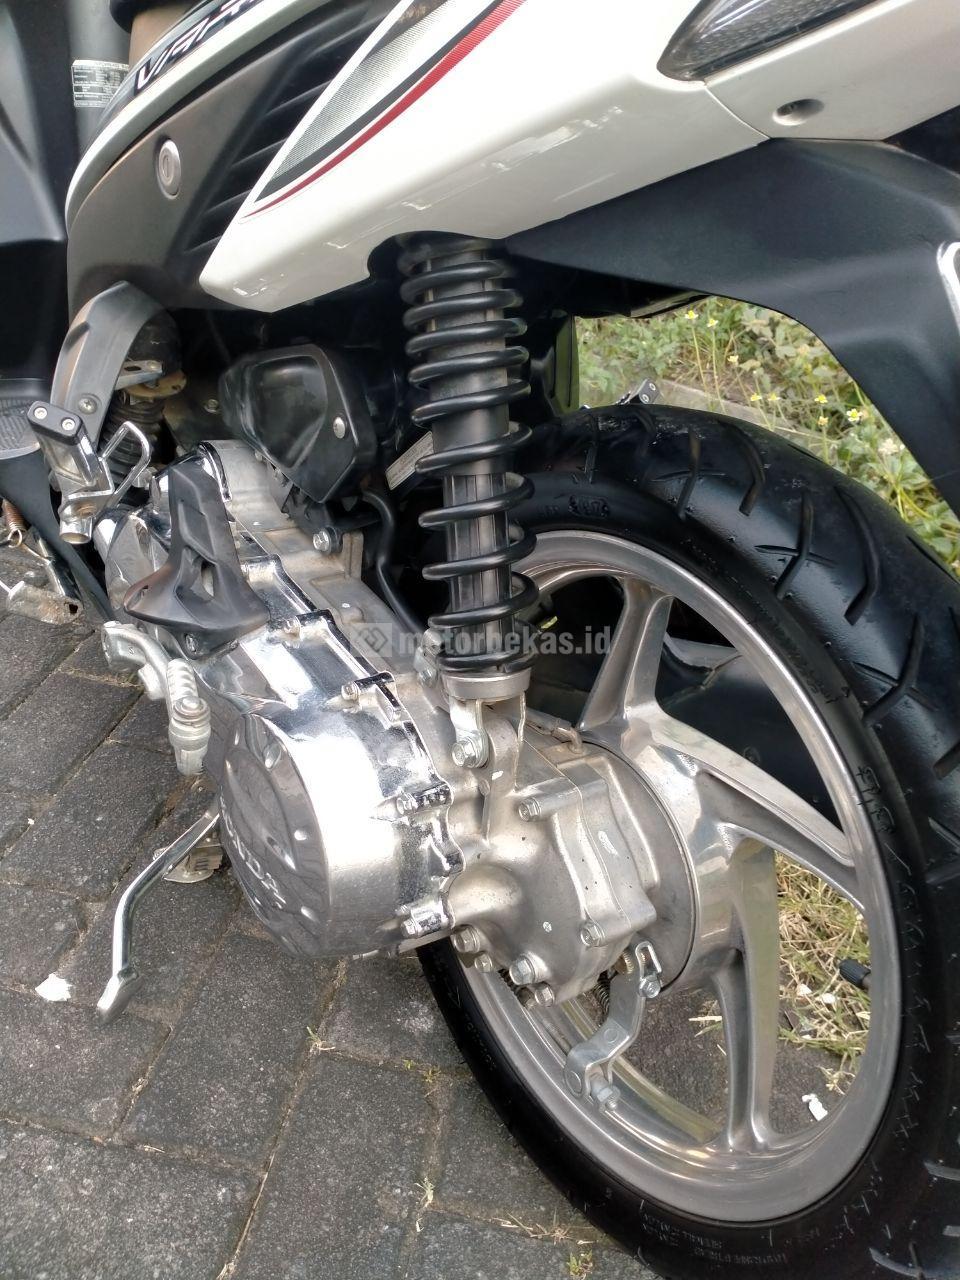 HONDA VARIO  3027 motorbekas.id